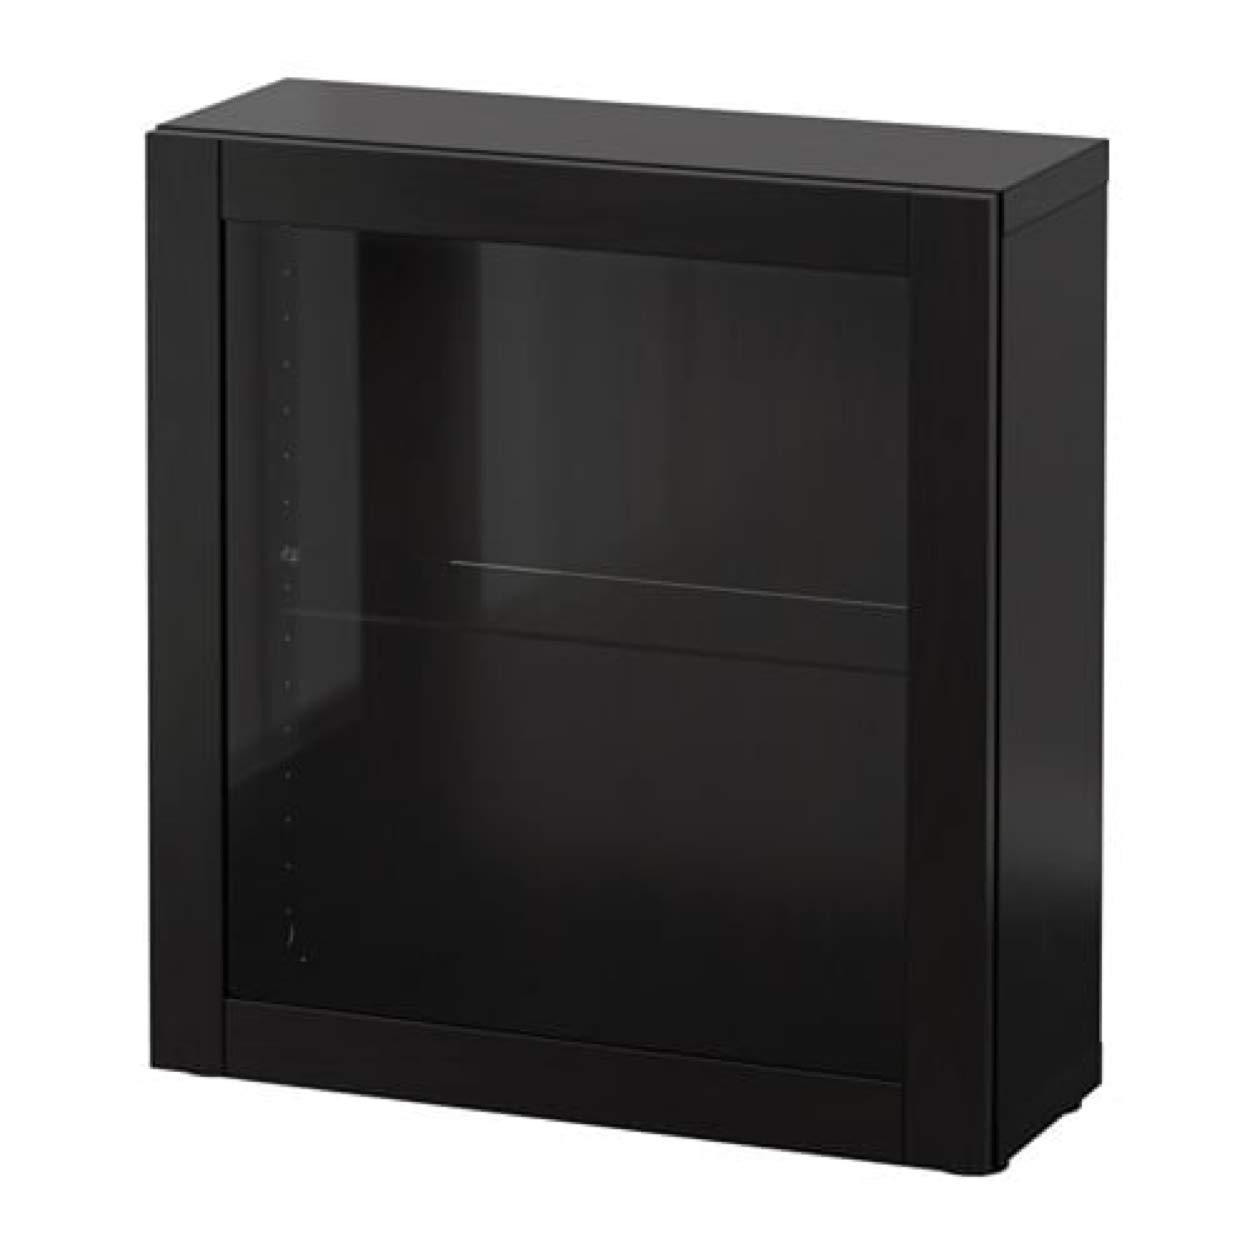 free shipping df199 de75f Amazon.com: IKEA Besta Shelf Unit with Glass Door Sindvik ...